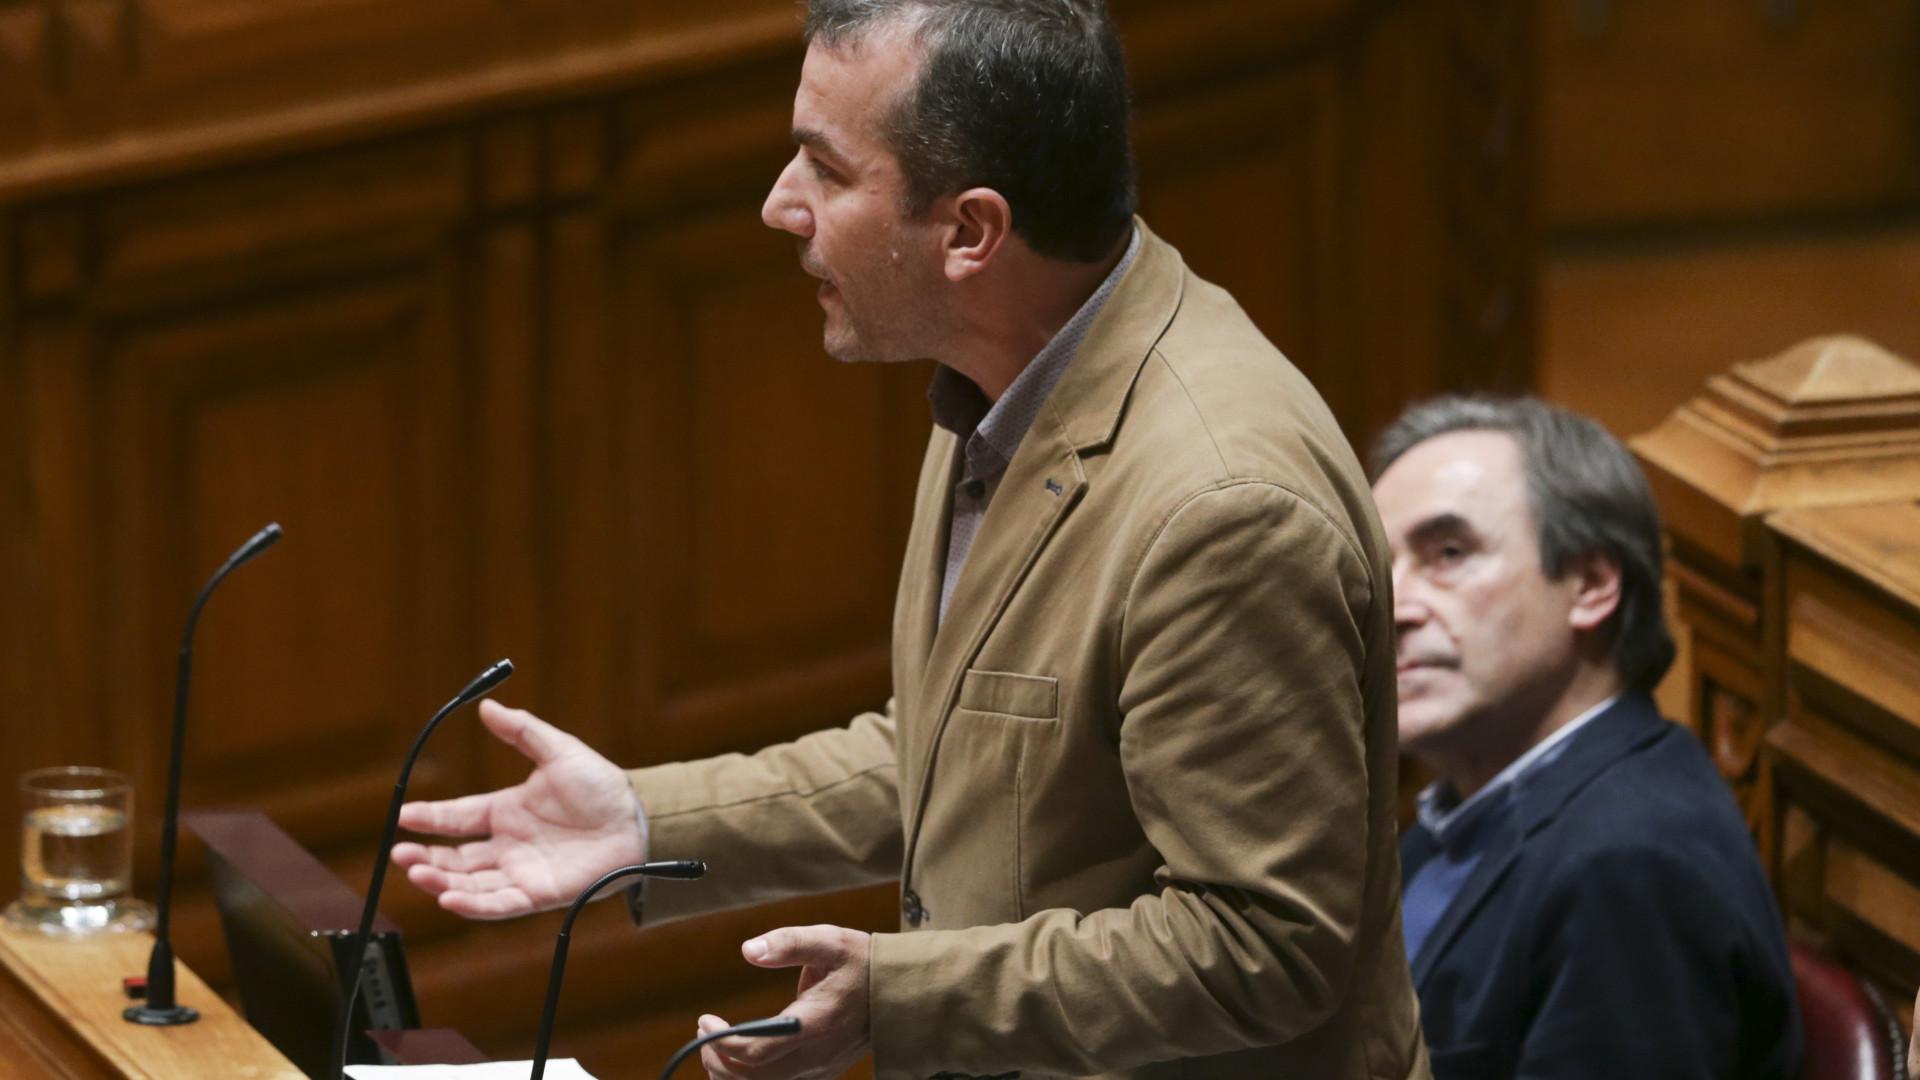 Reembolsos de viagens: deputado do BE renuncia a mandato parlamentar